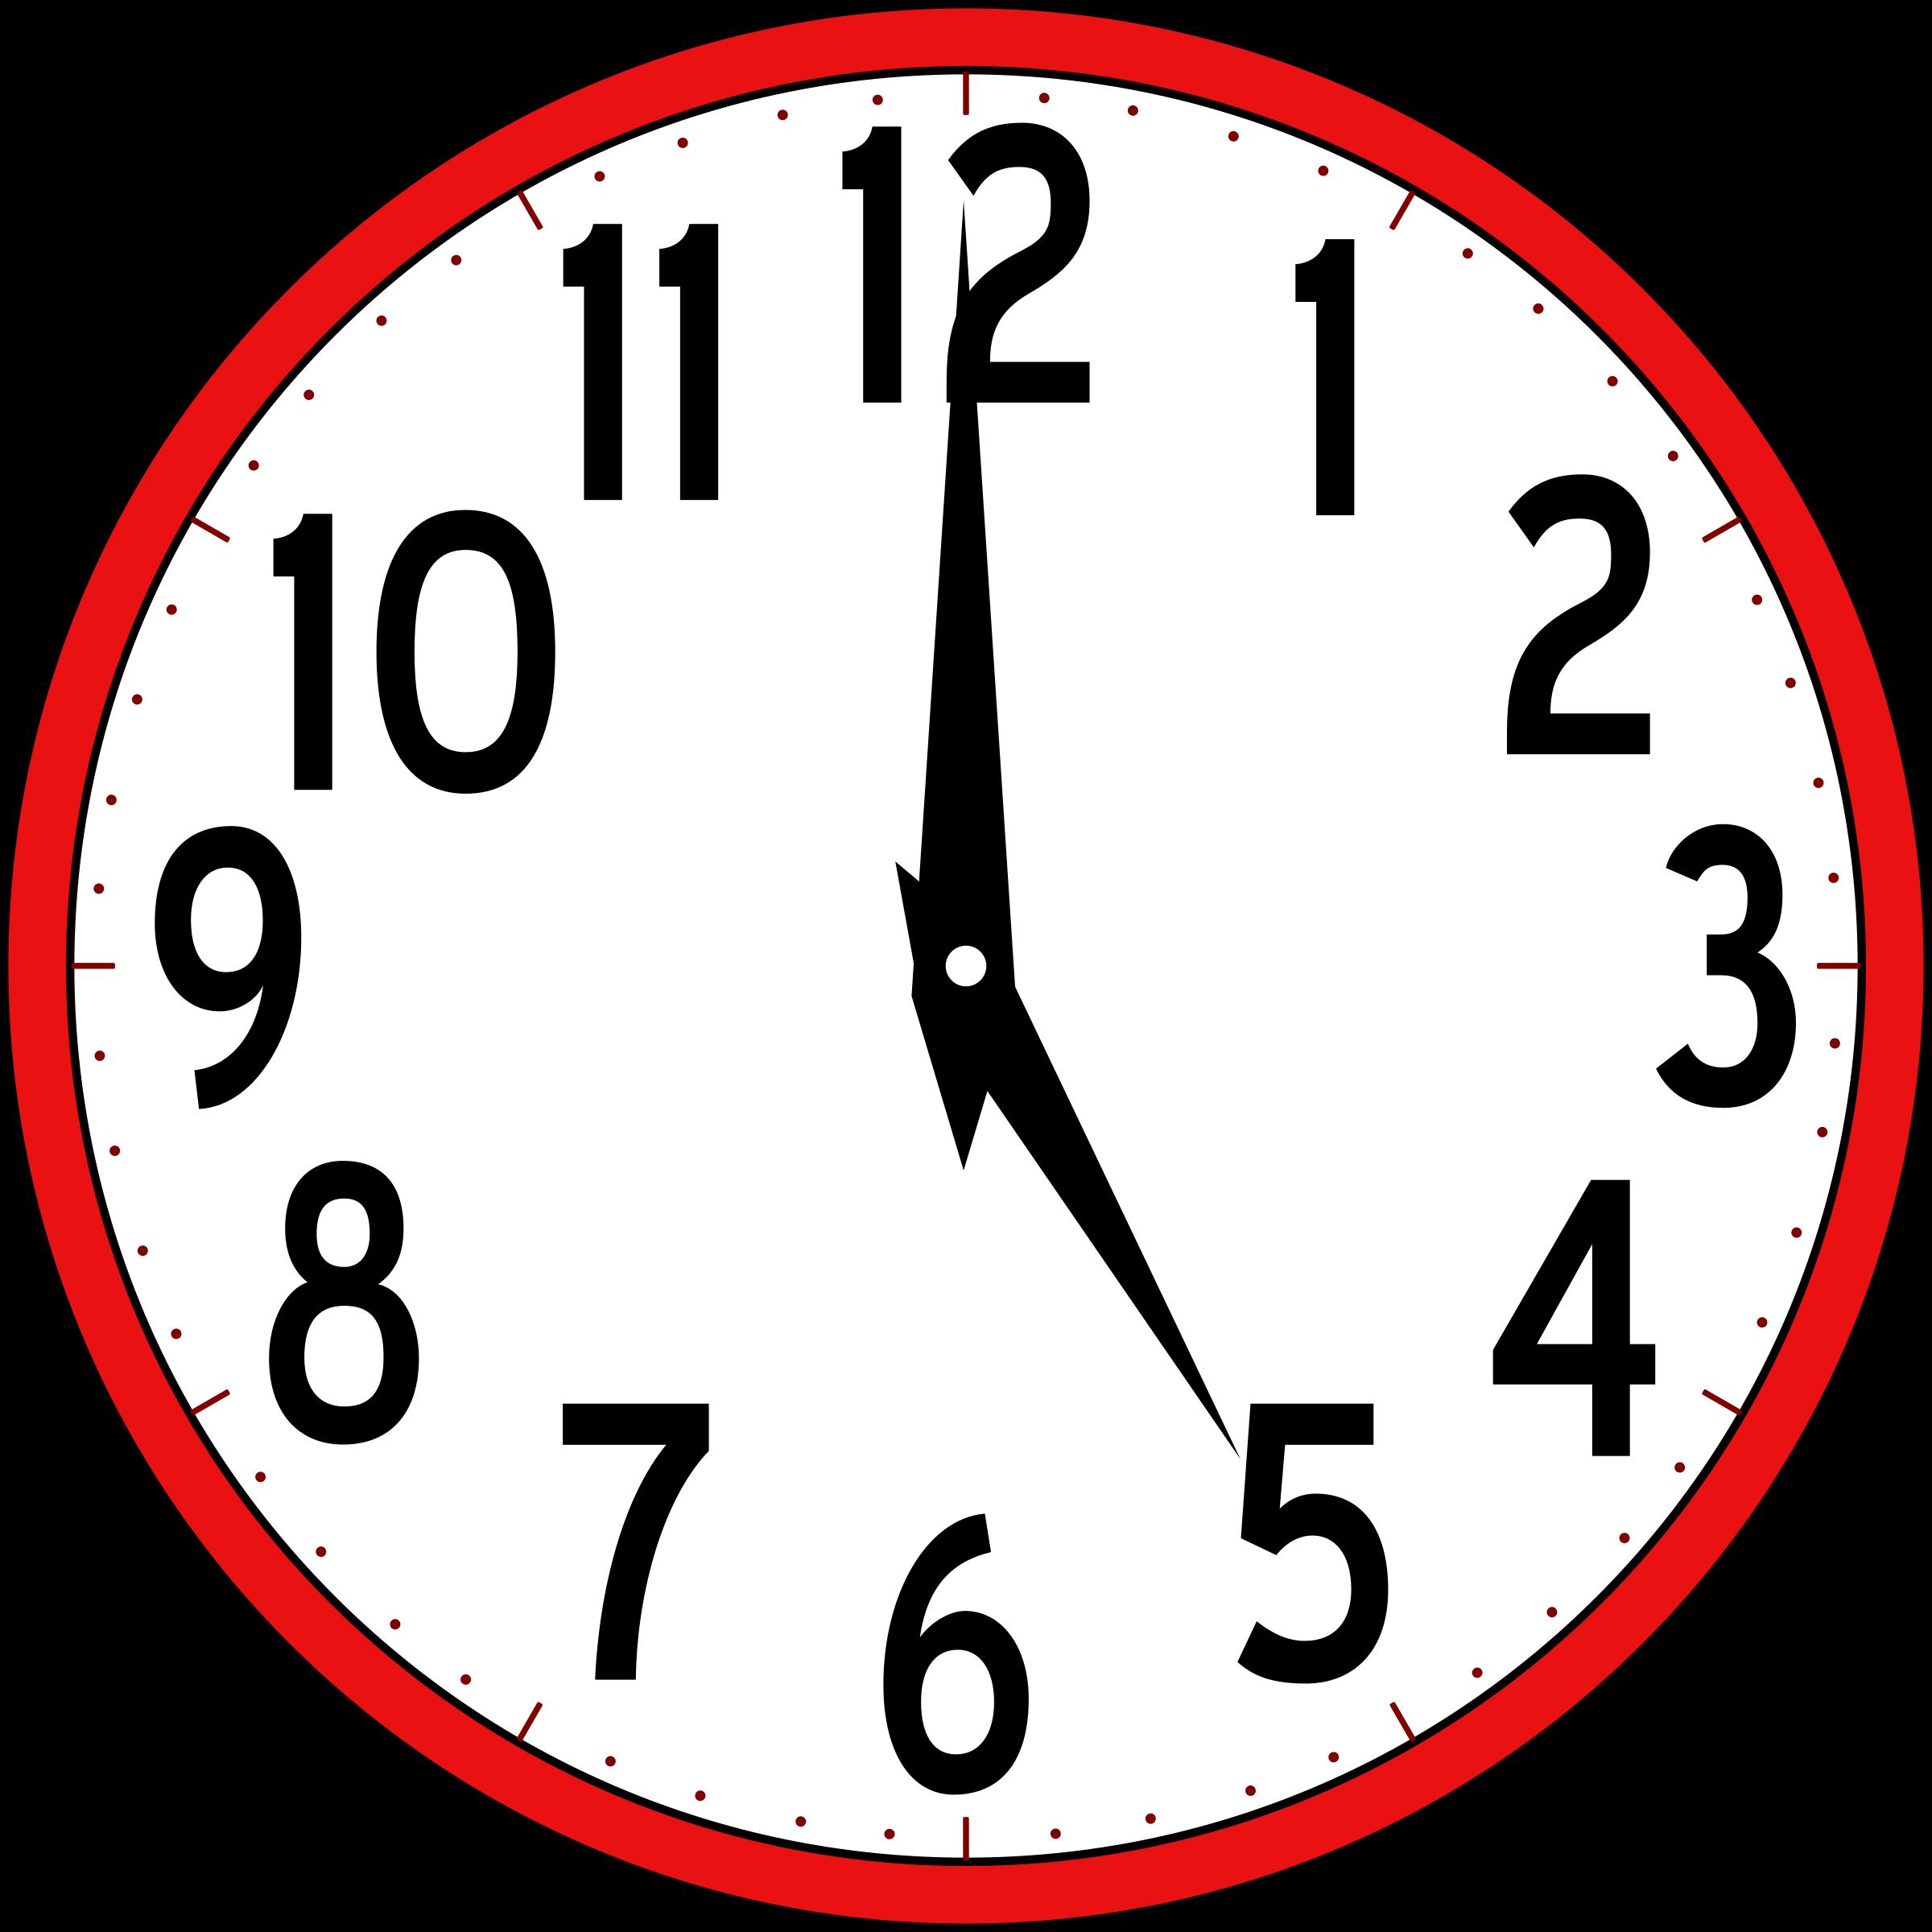 Clock Clip Art Free | Clipart Panda - Free Clipart Images